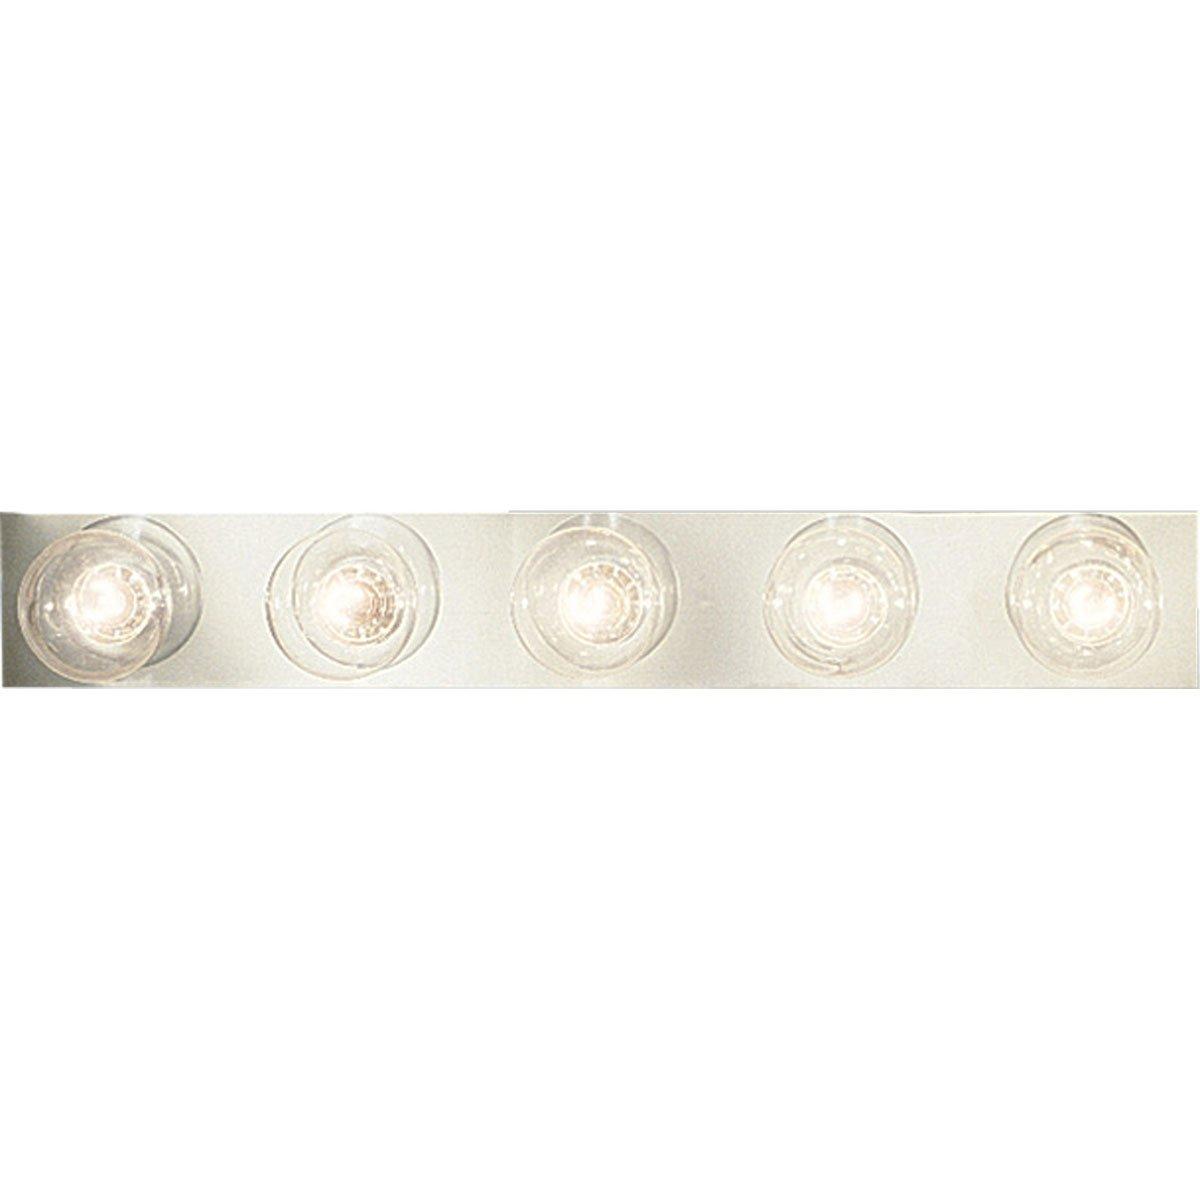 Progress Lighting P3335-15 5-Light Broadway Lighting Strips with Sockets On 6-Inch Centers, Polished Chrome